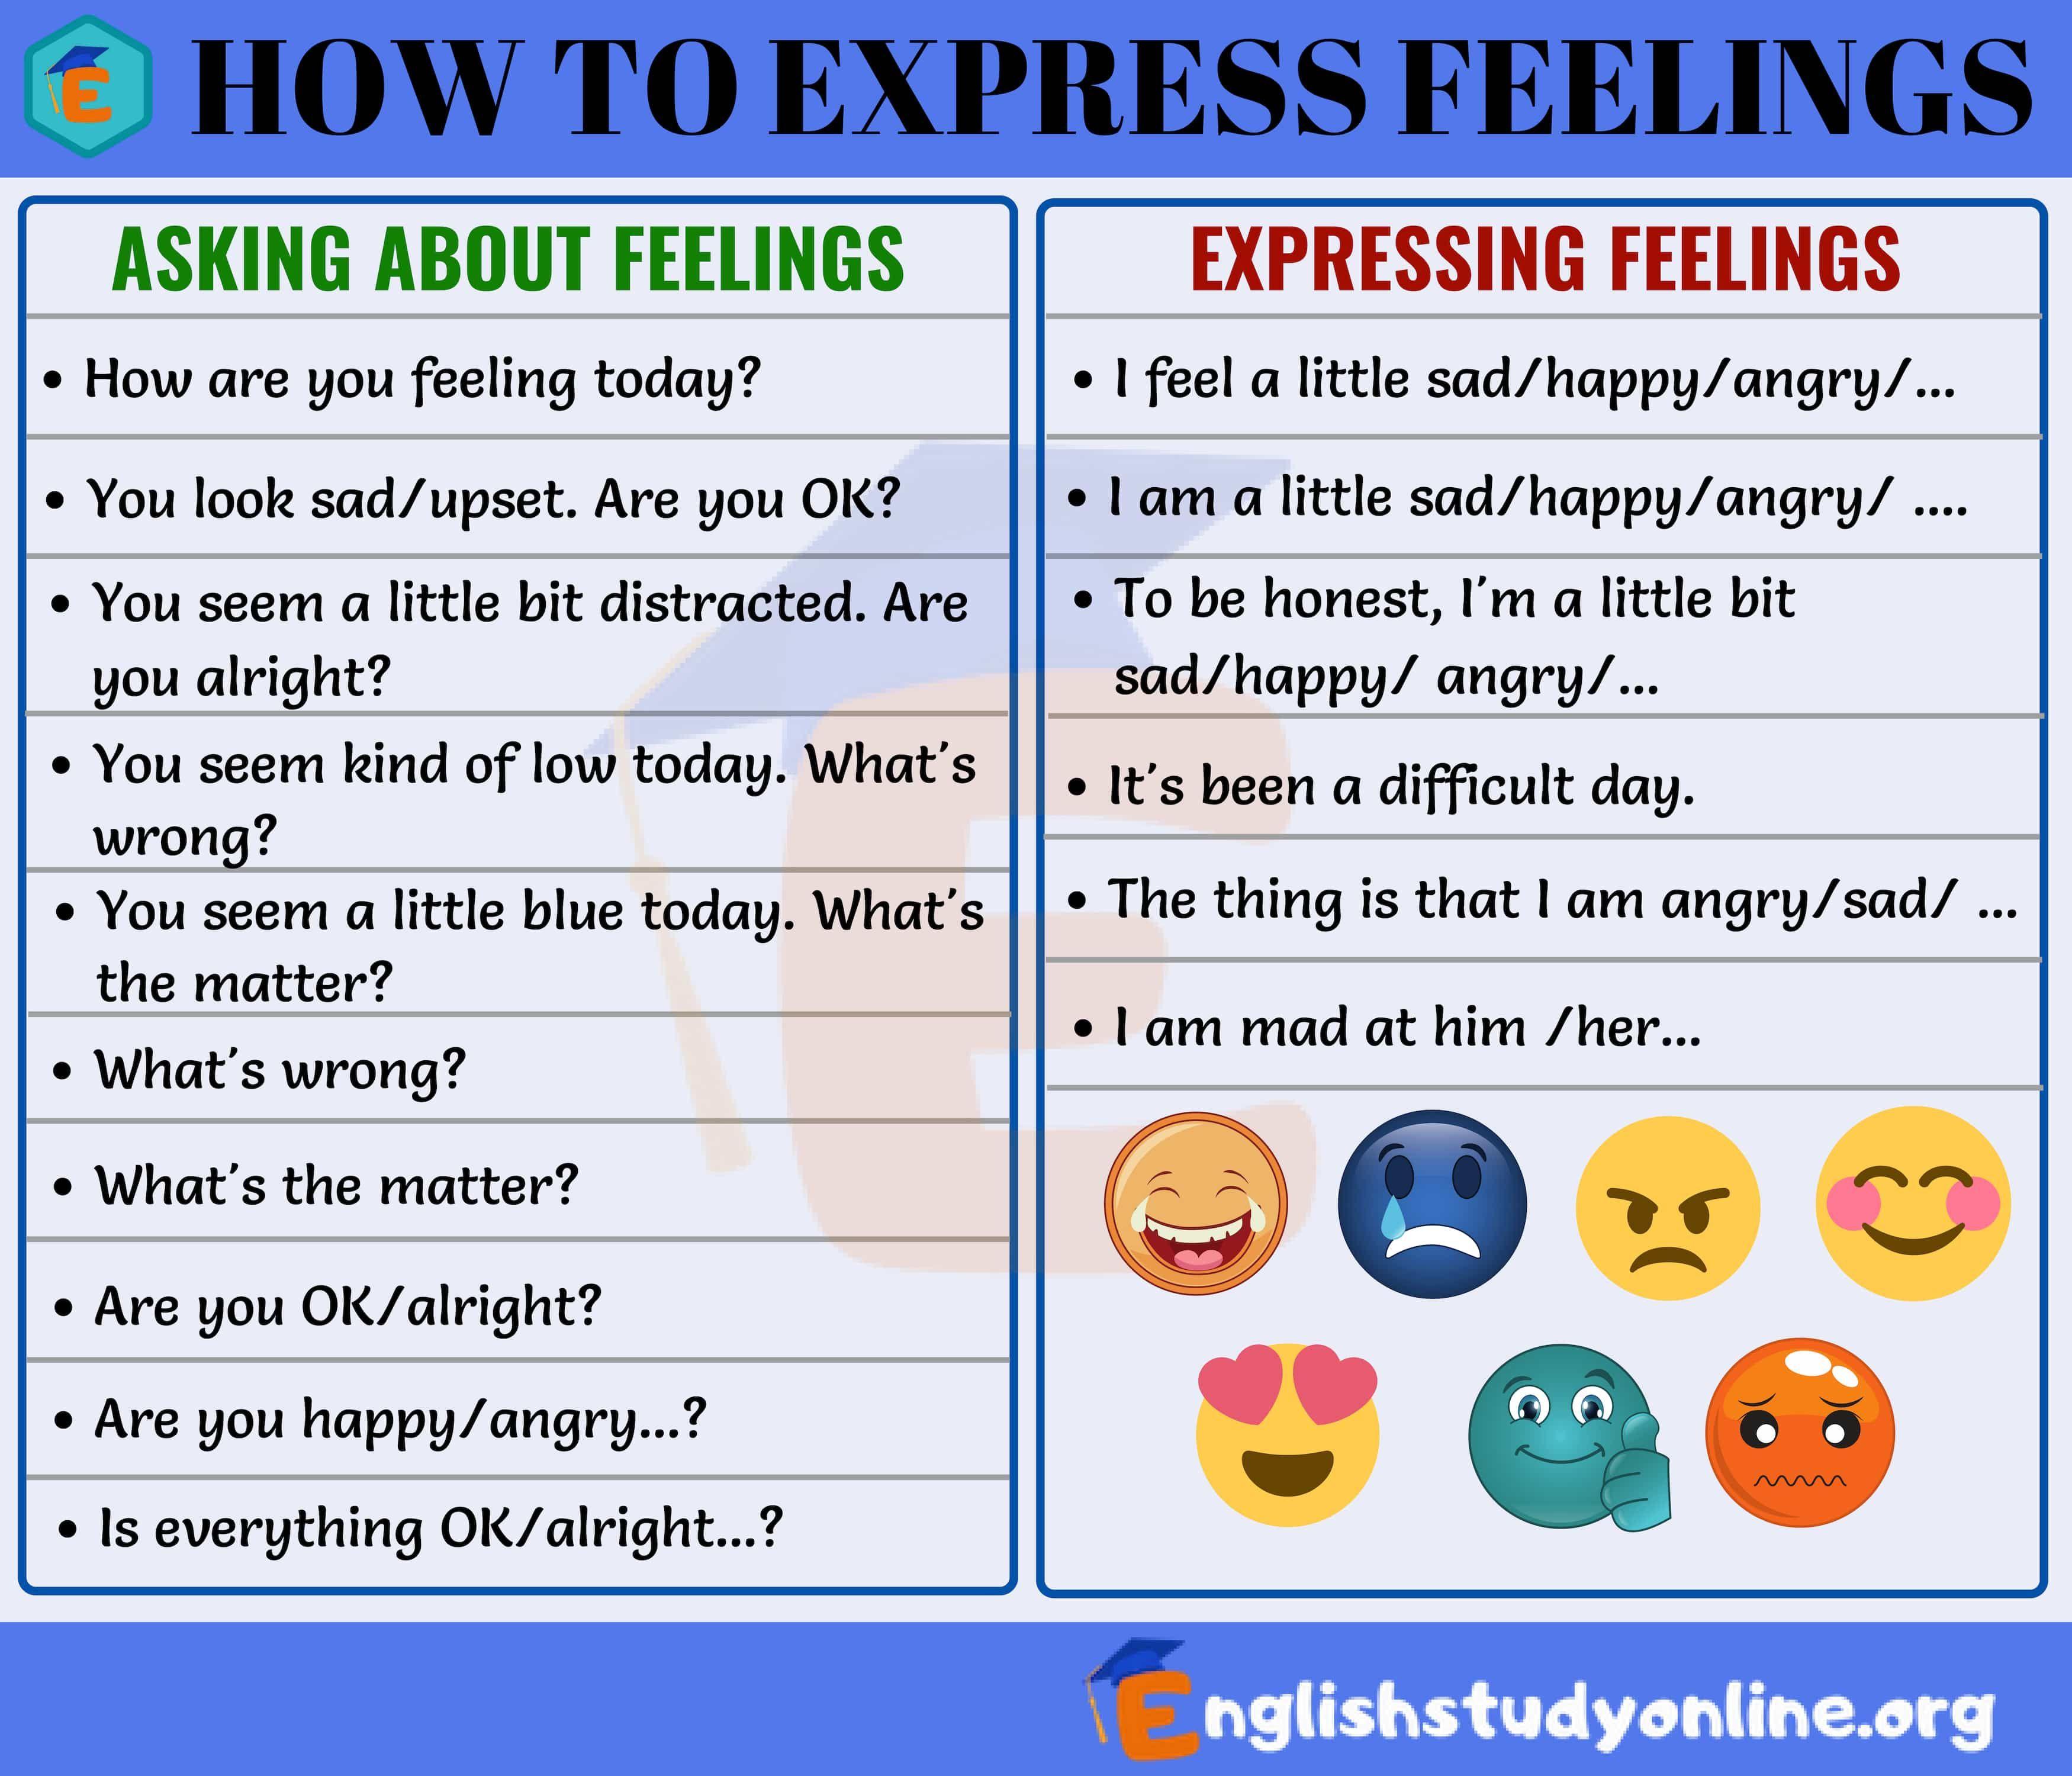 How to Express Feelings | How to express feelings